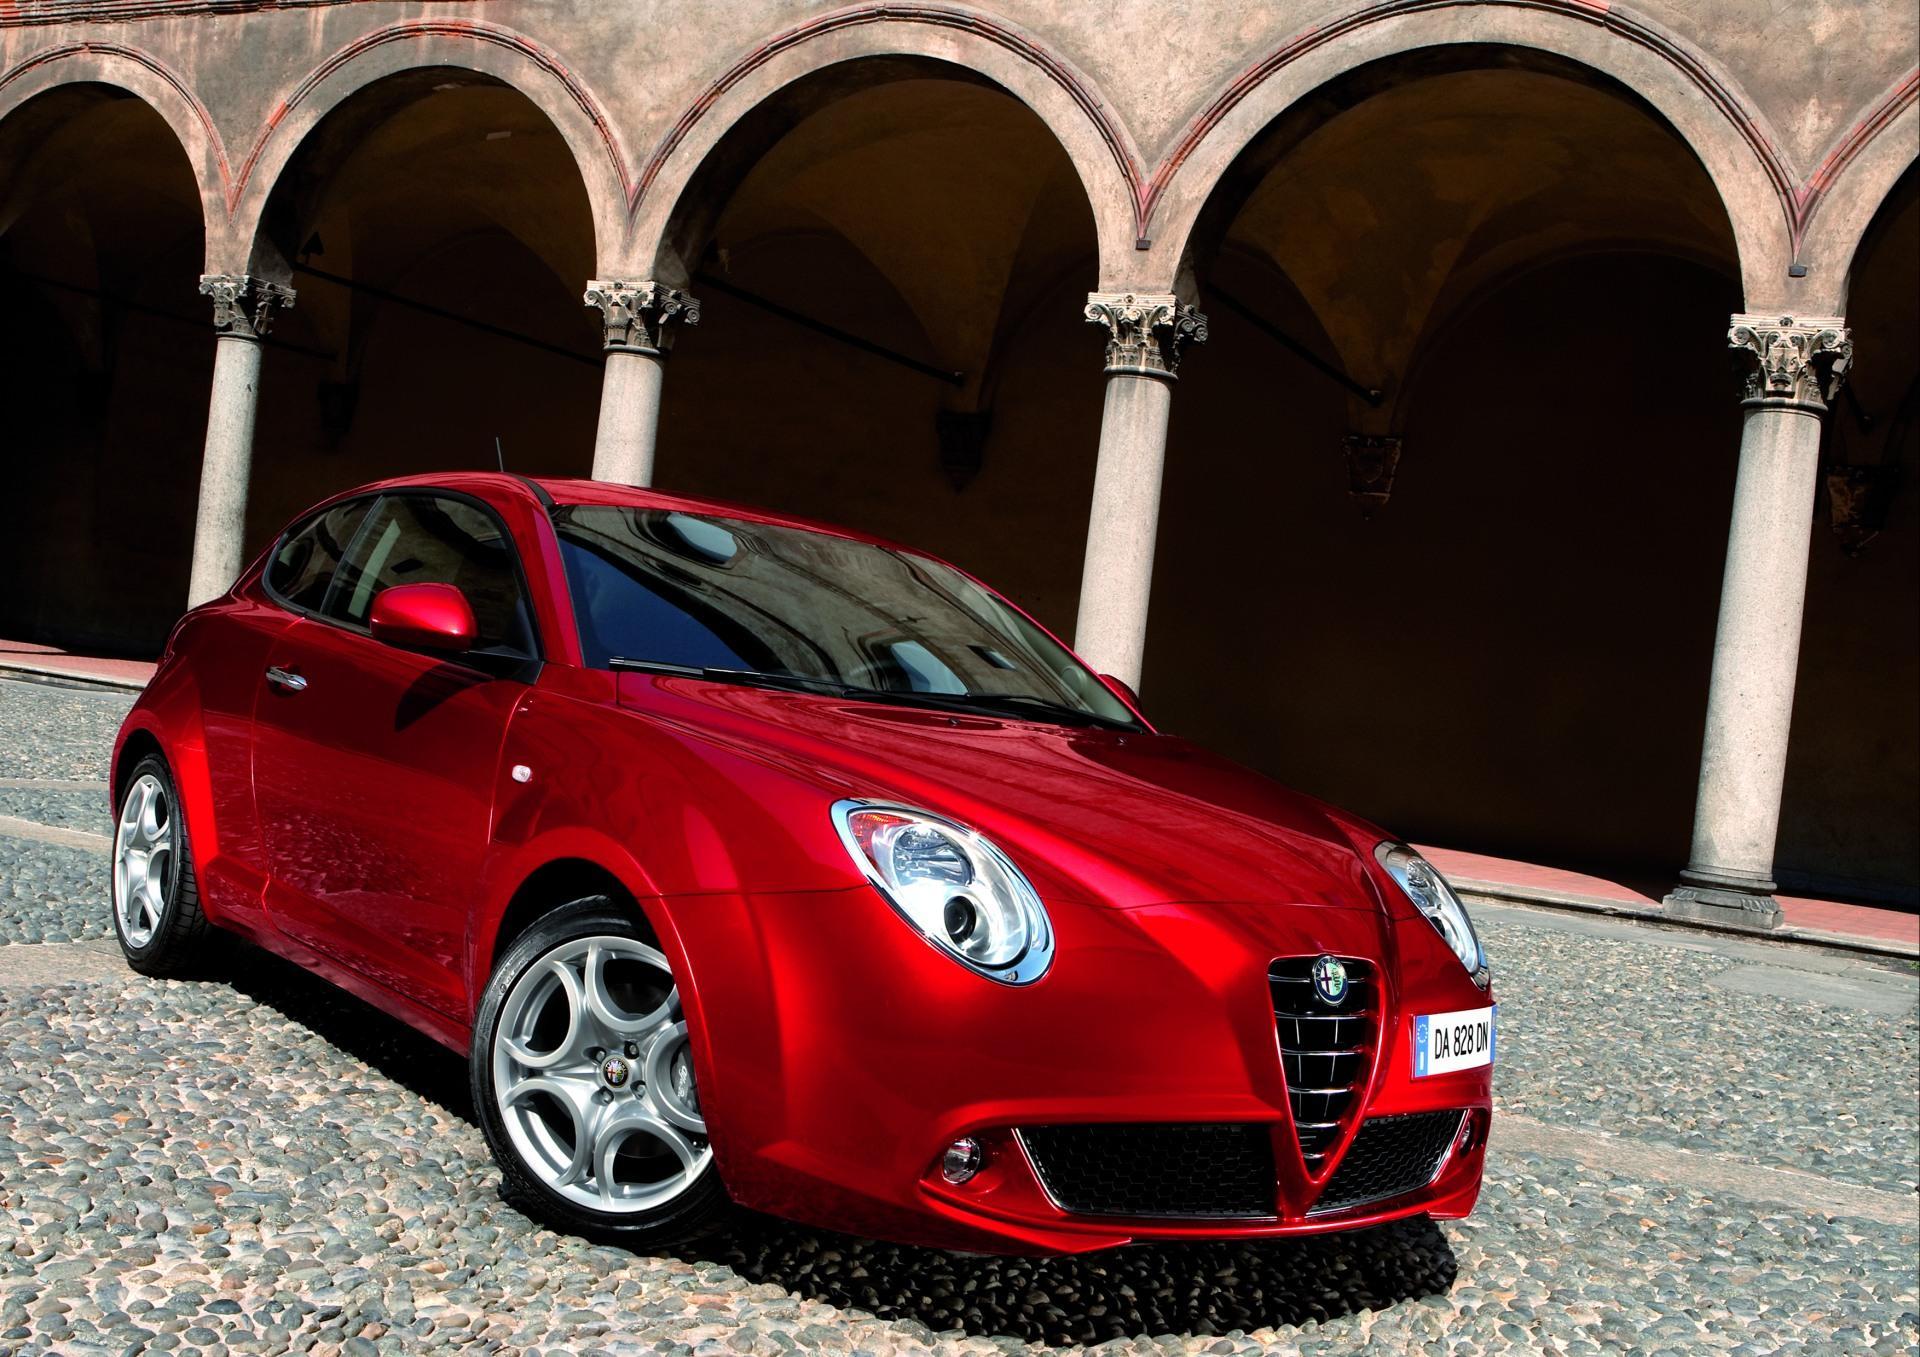 Alfa Romeo Бордовая  № 2426425 без смс